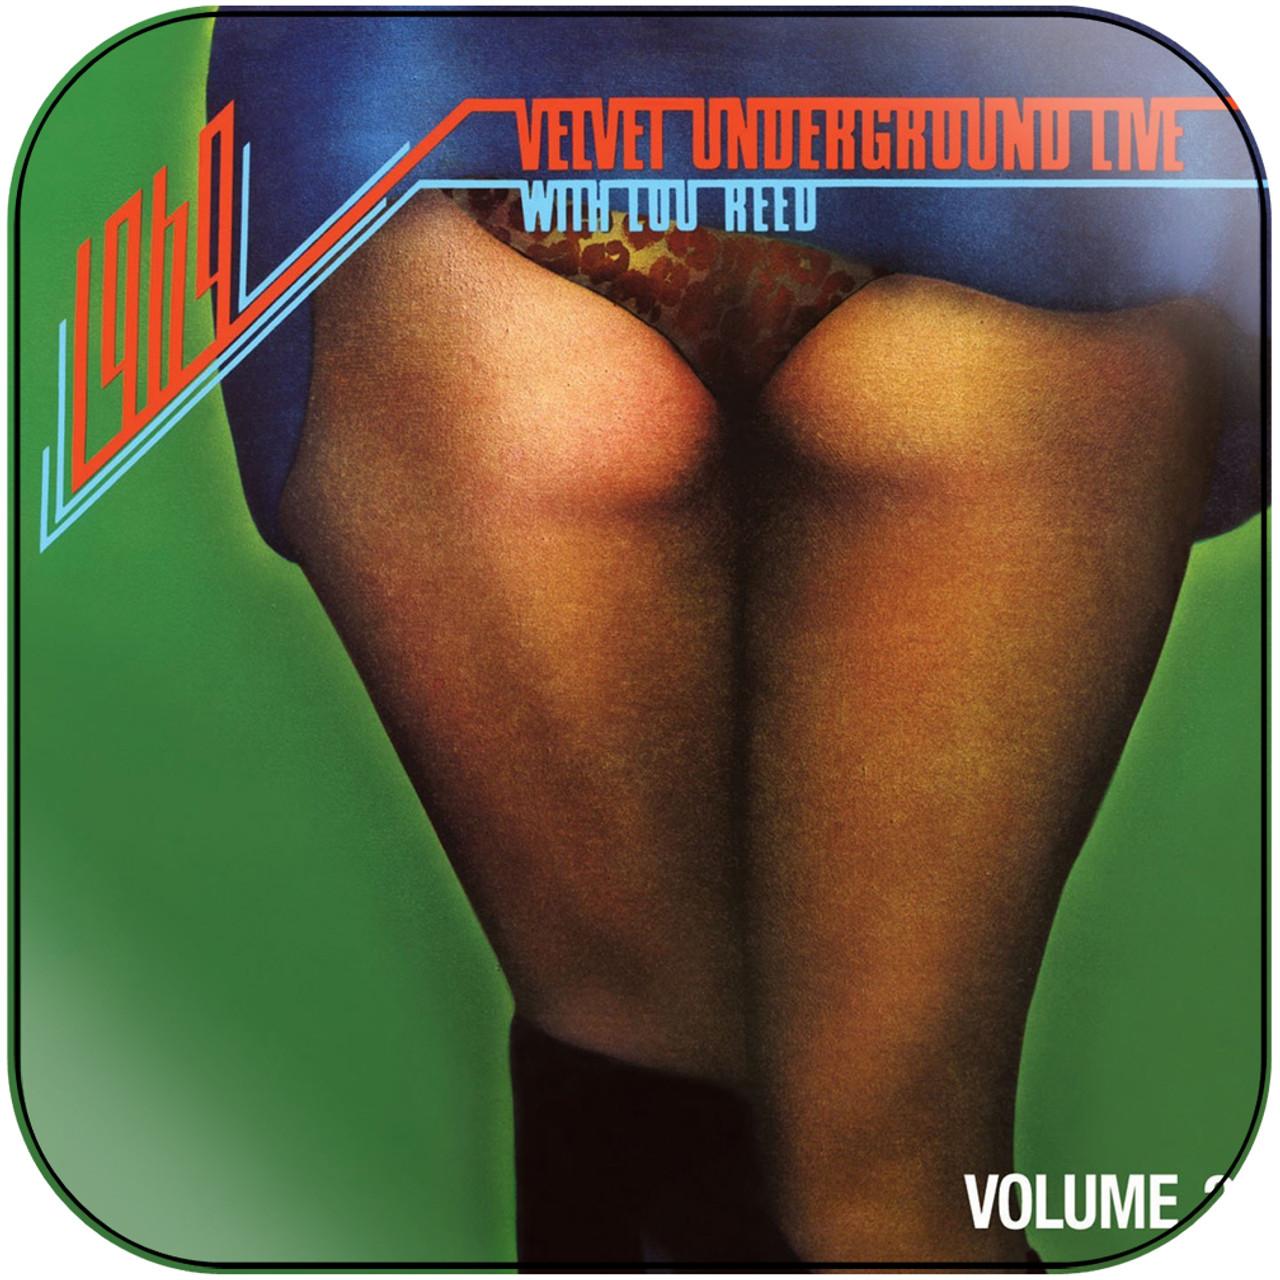 The Velvet Underground - 1969 Velvet Underground Live With Lou Reed Volume  2 Album Cover Sticker